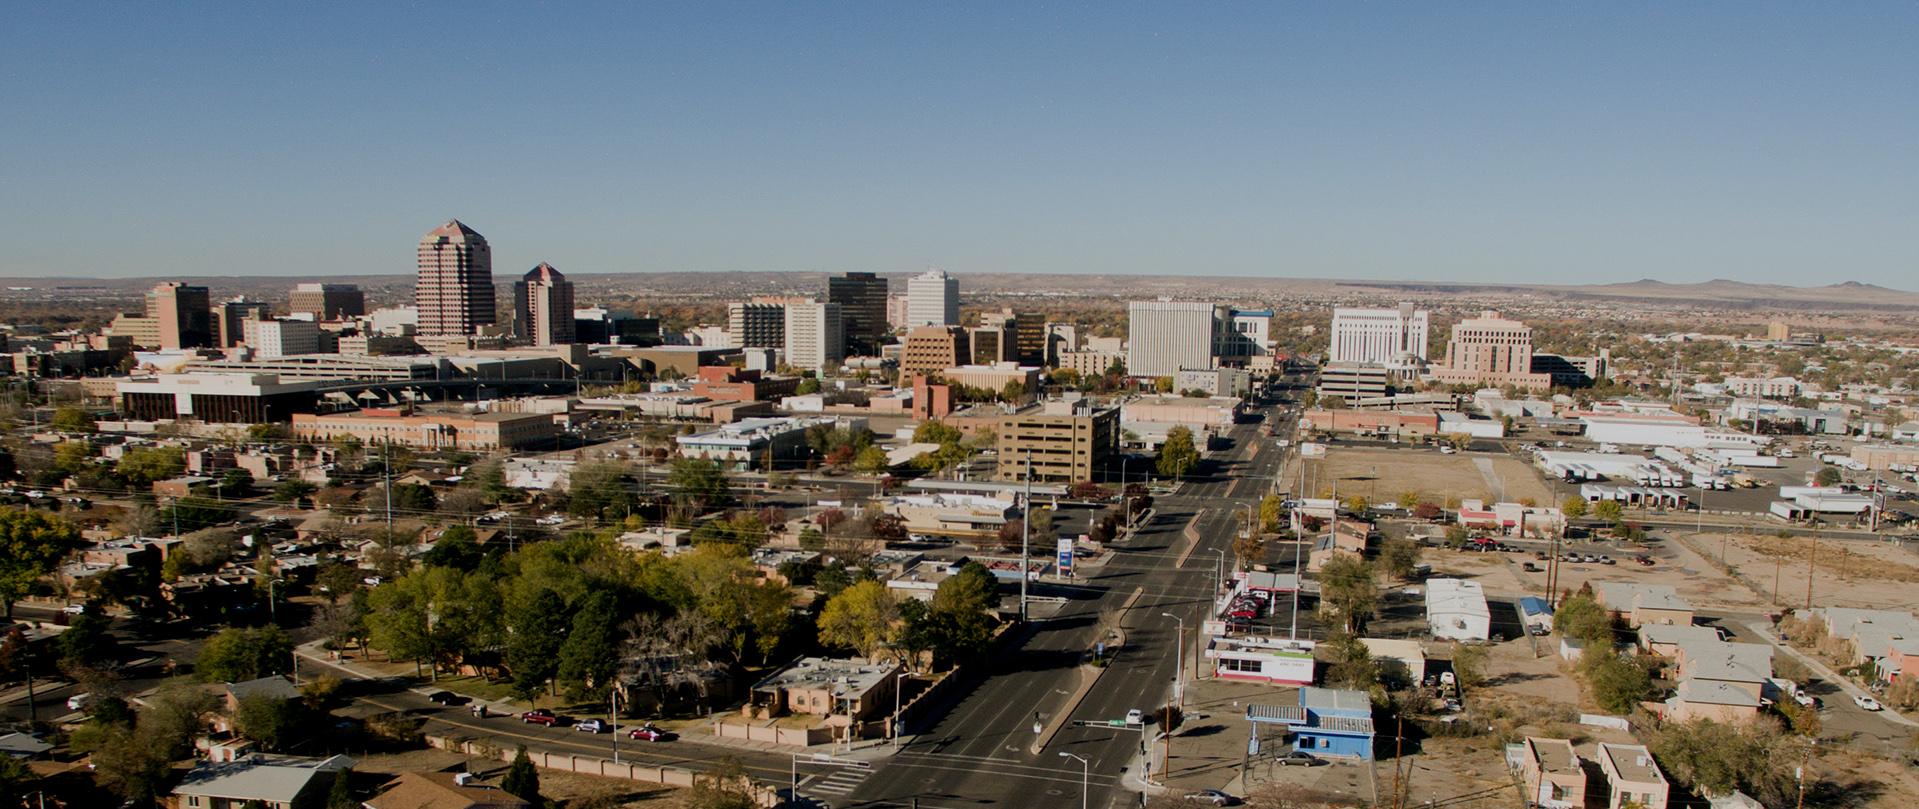 Albuquerque Downtown City Metro Skyline Desert South New Mexico